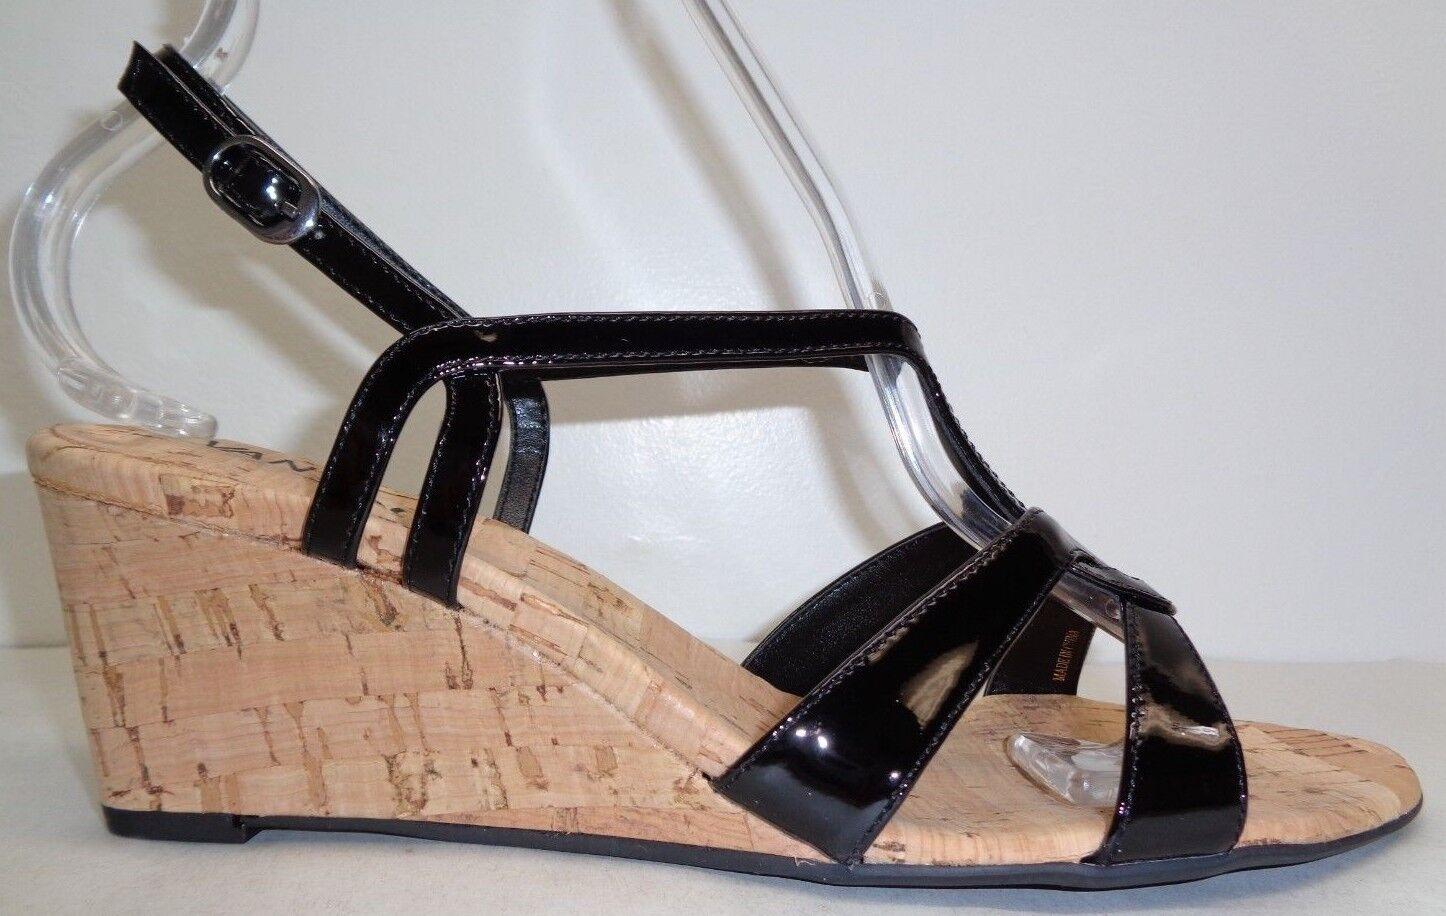 VANELI Matty Charol Negro Cuña Tacón Sandalias nuevo Zapatos para mujer